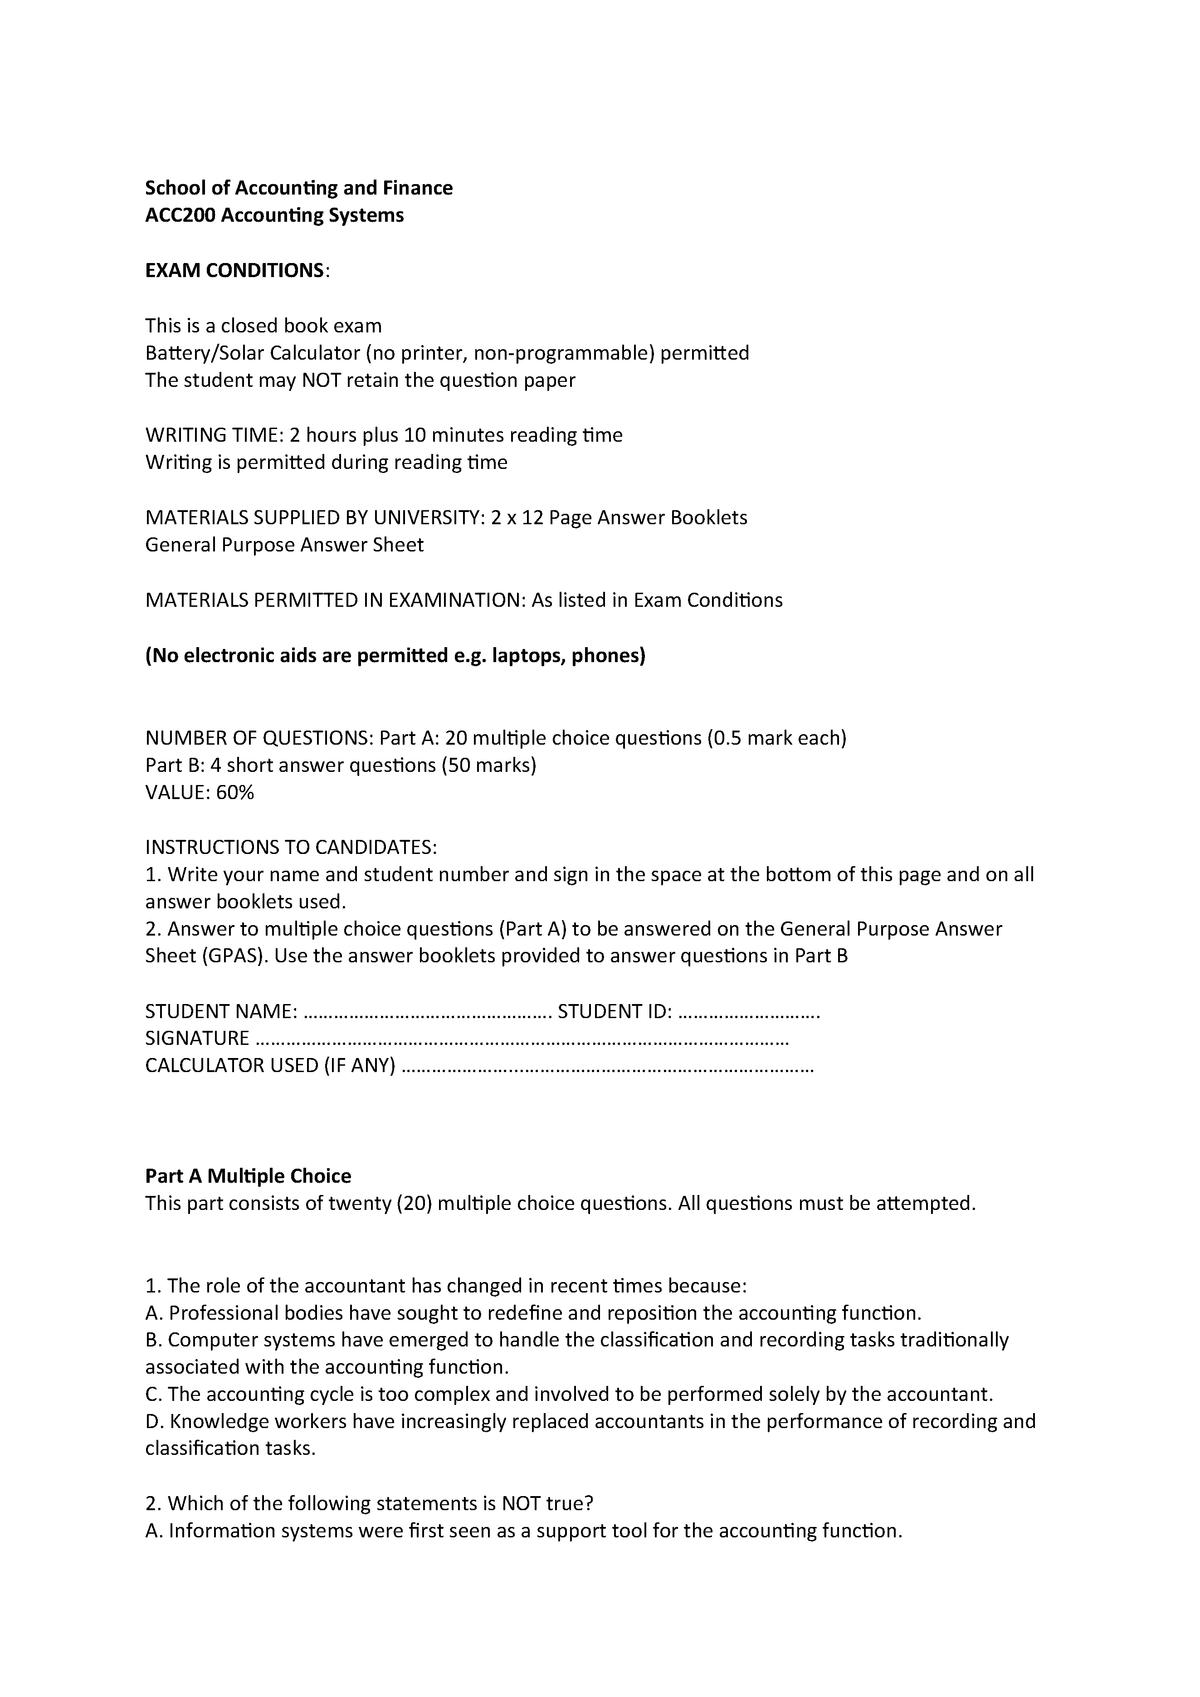 Sample/practice exam 2017, questions - ACC200 - CSU - StuDocu